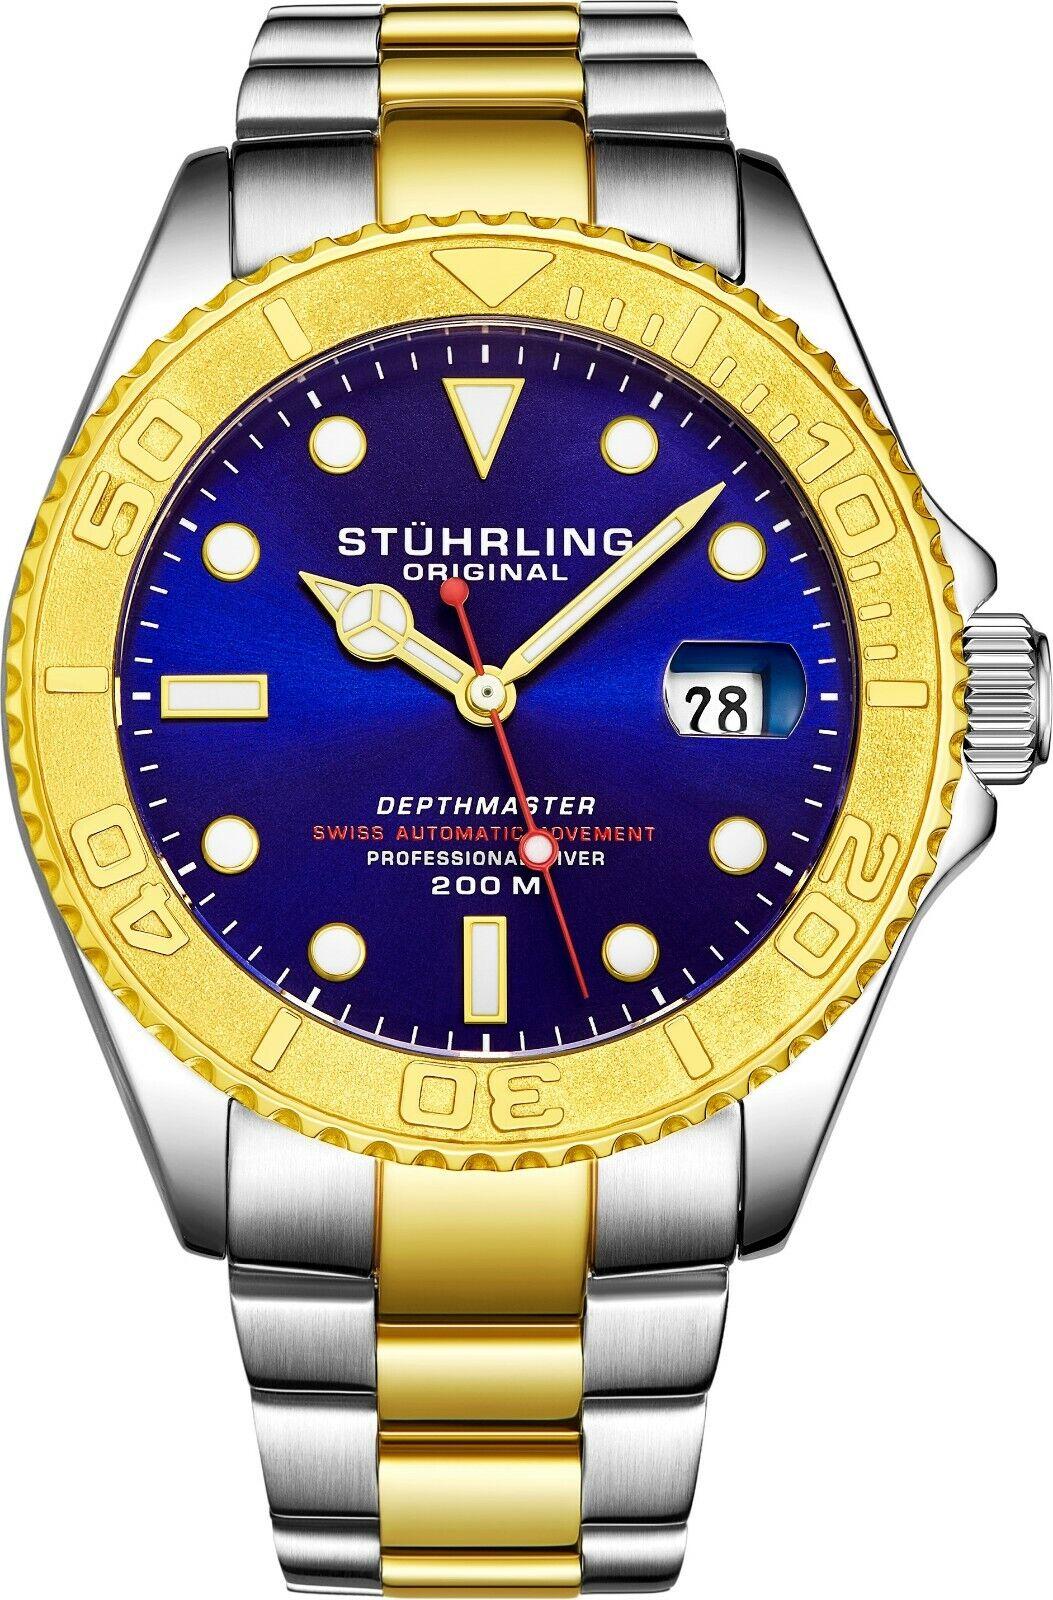 Stuhrling Depthmaster Men's 18 Jewel Swiss Automatic 200 Meter Dive Watch 893.04